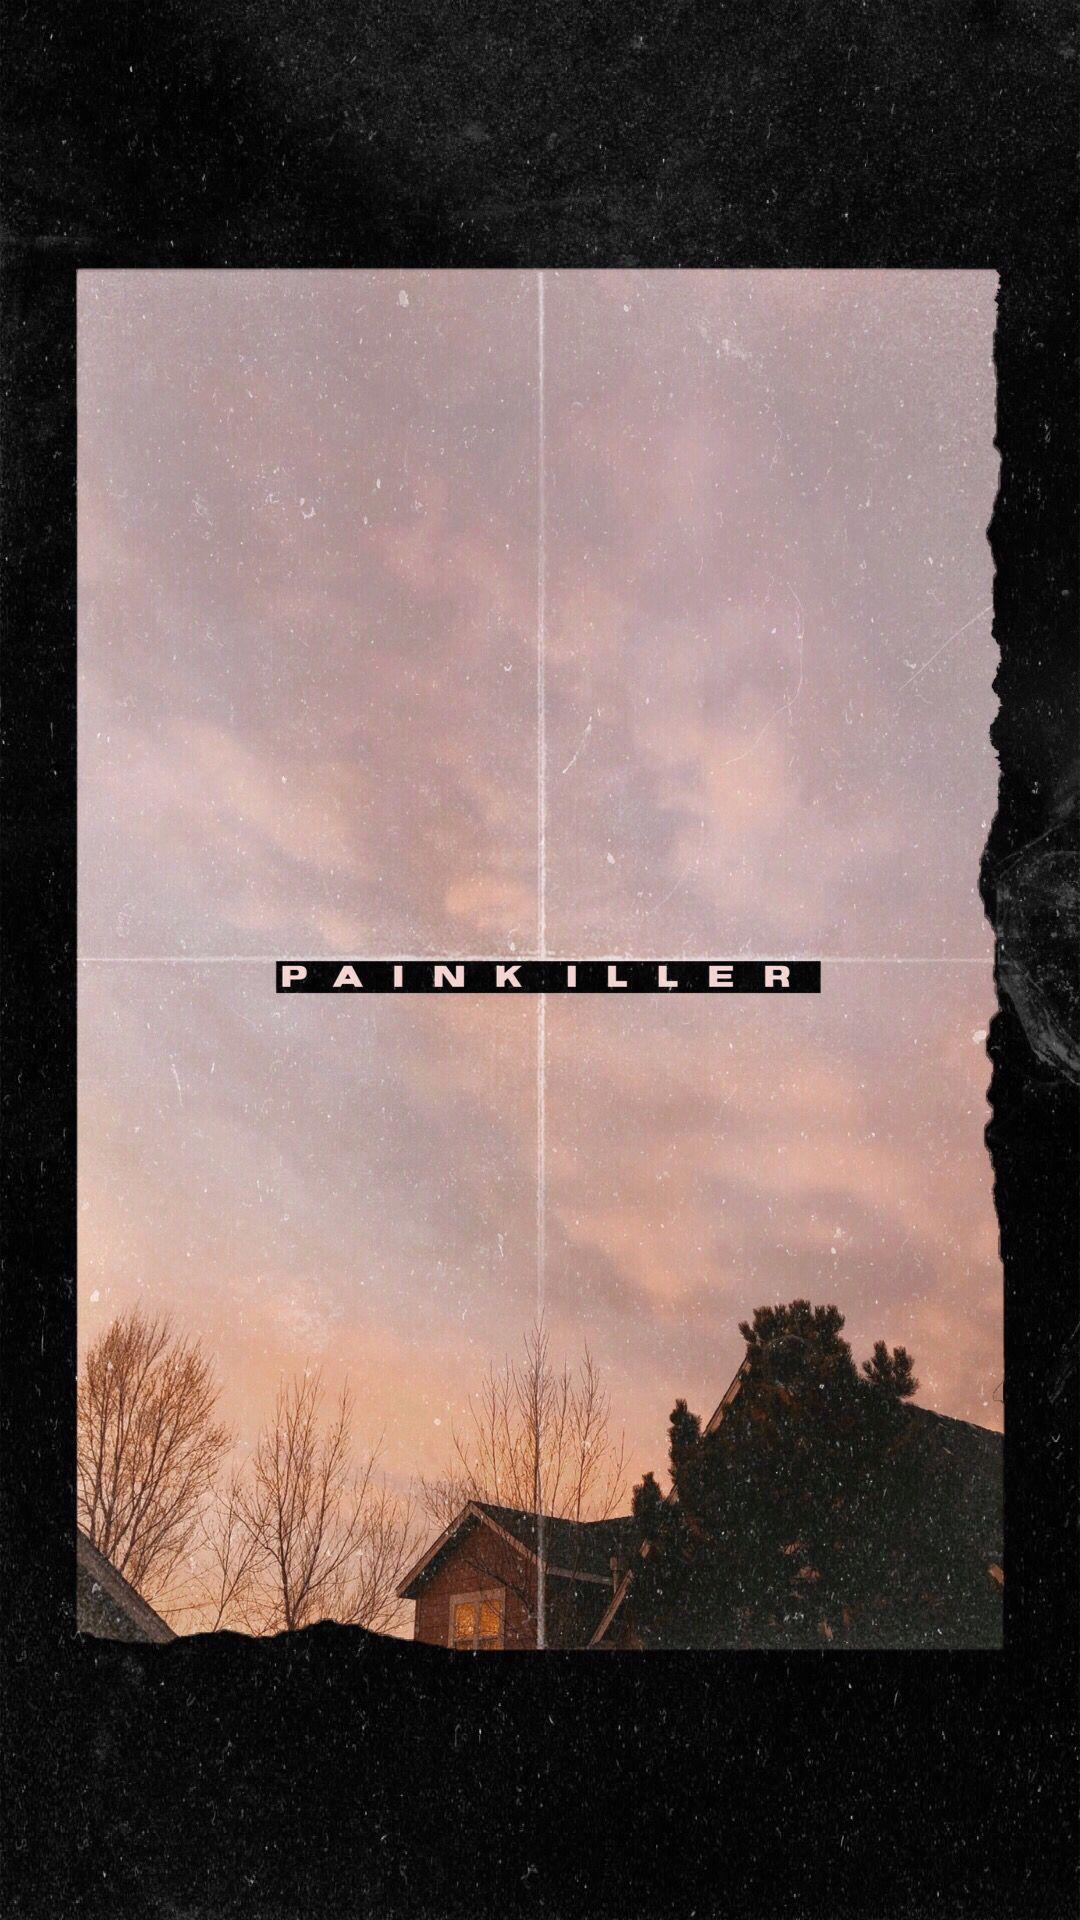 Nathalieacacia03 Ruel Painkiller Wallpaper Sunset Aesthetic